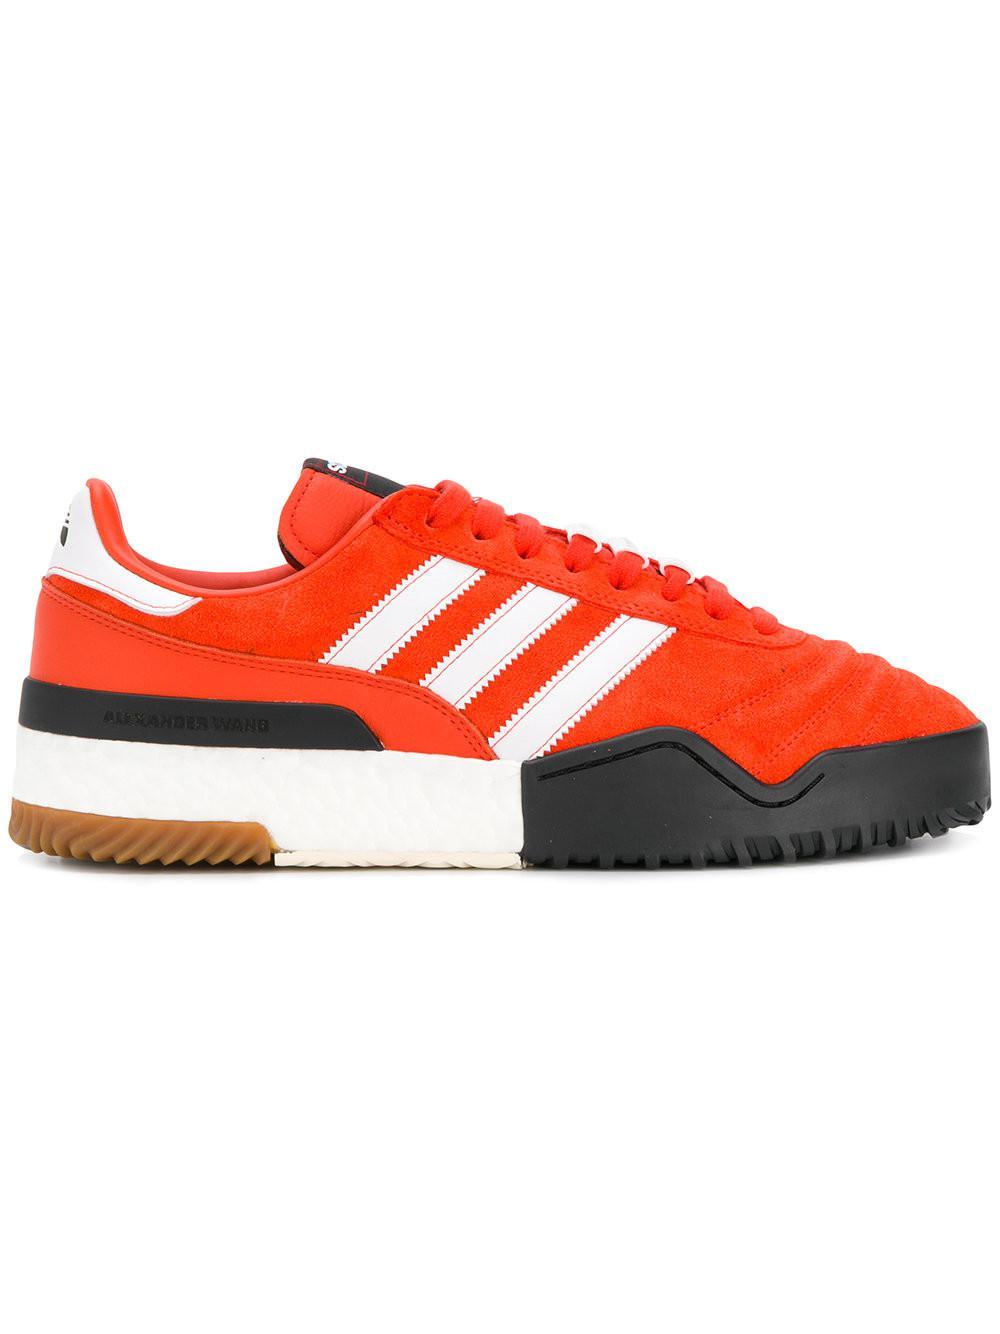 best sneakers 45af1 55efb Alexander Wang Bball Soccer Sneakers for Men - Lyst